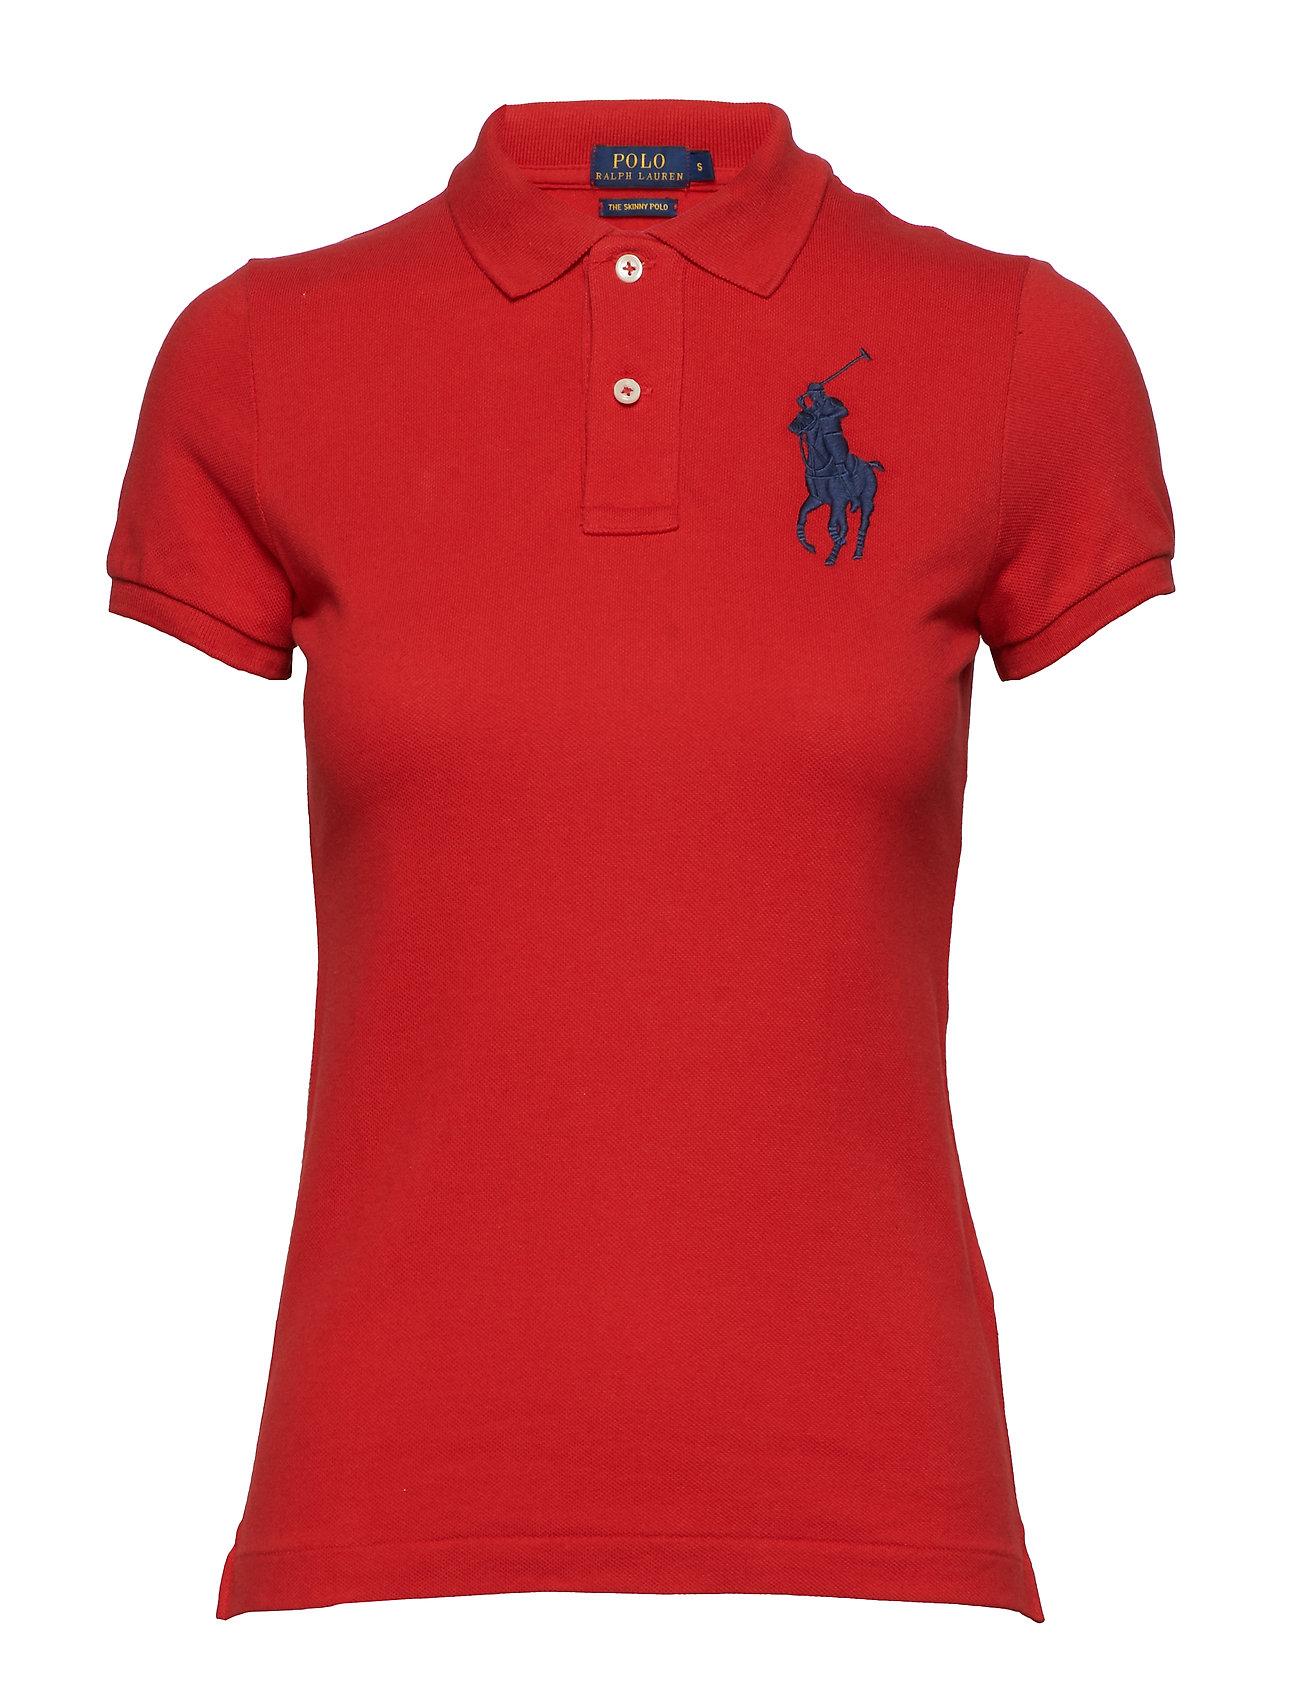 Polo Ralph Lauren Skinny-Fit Big Pony Polo Shirt - RL2000 RED